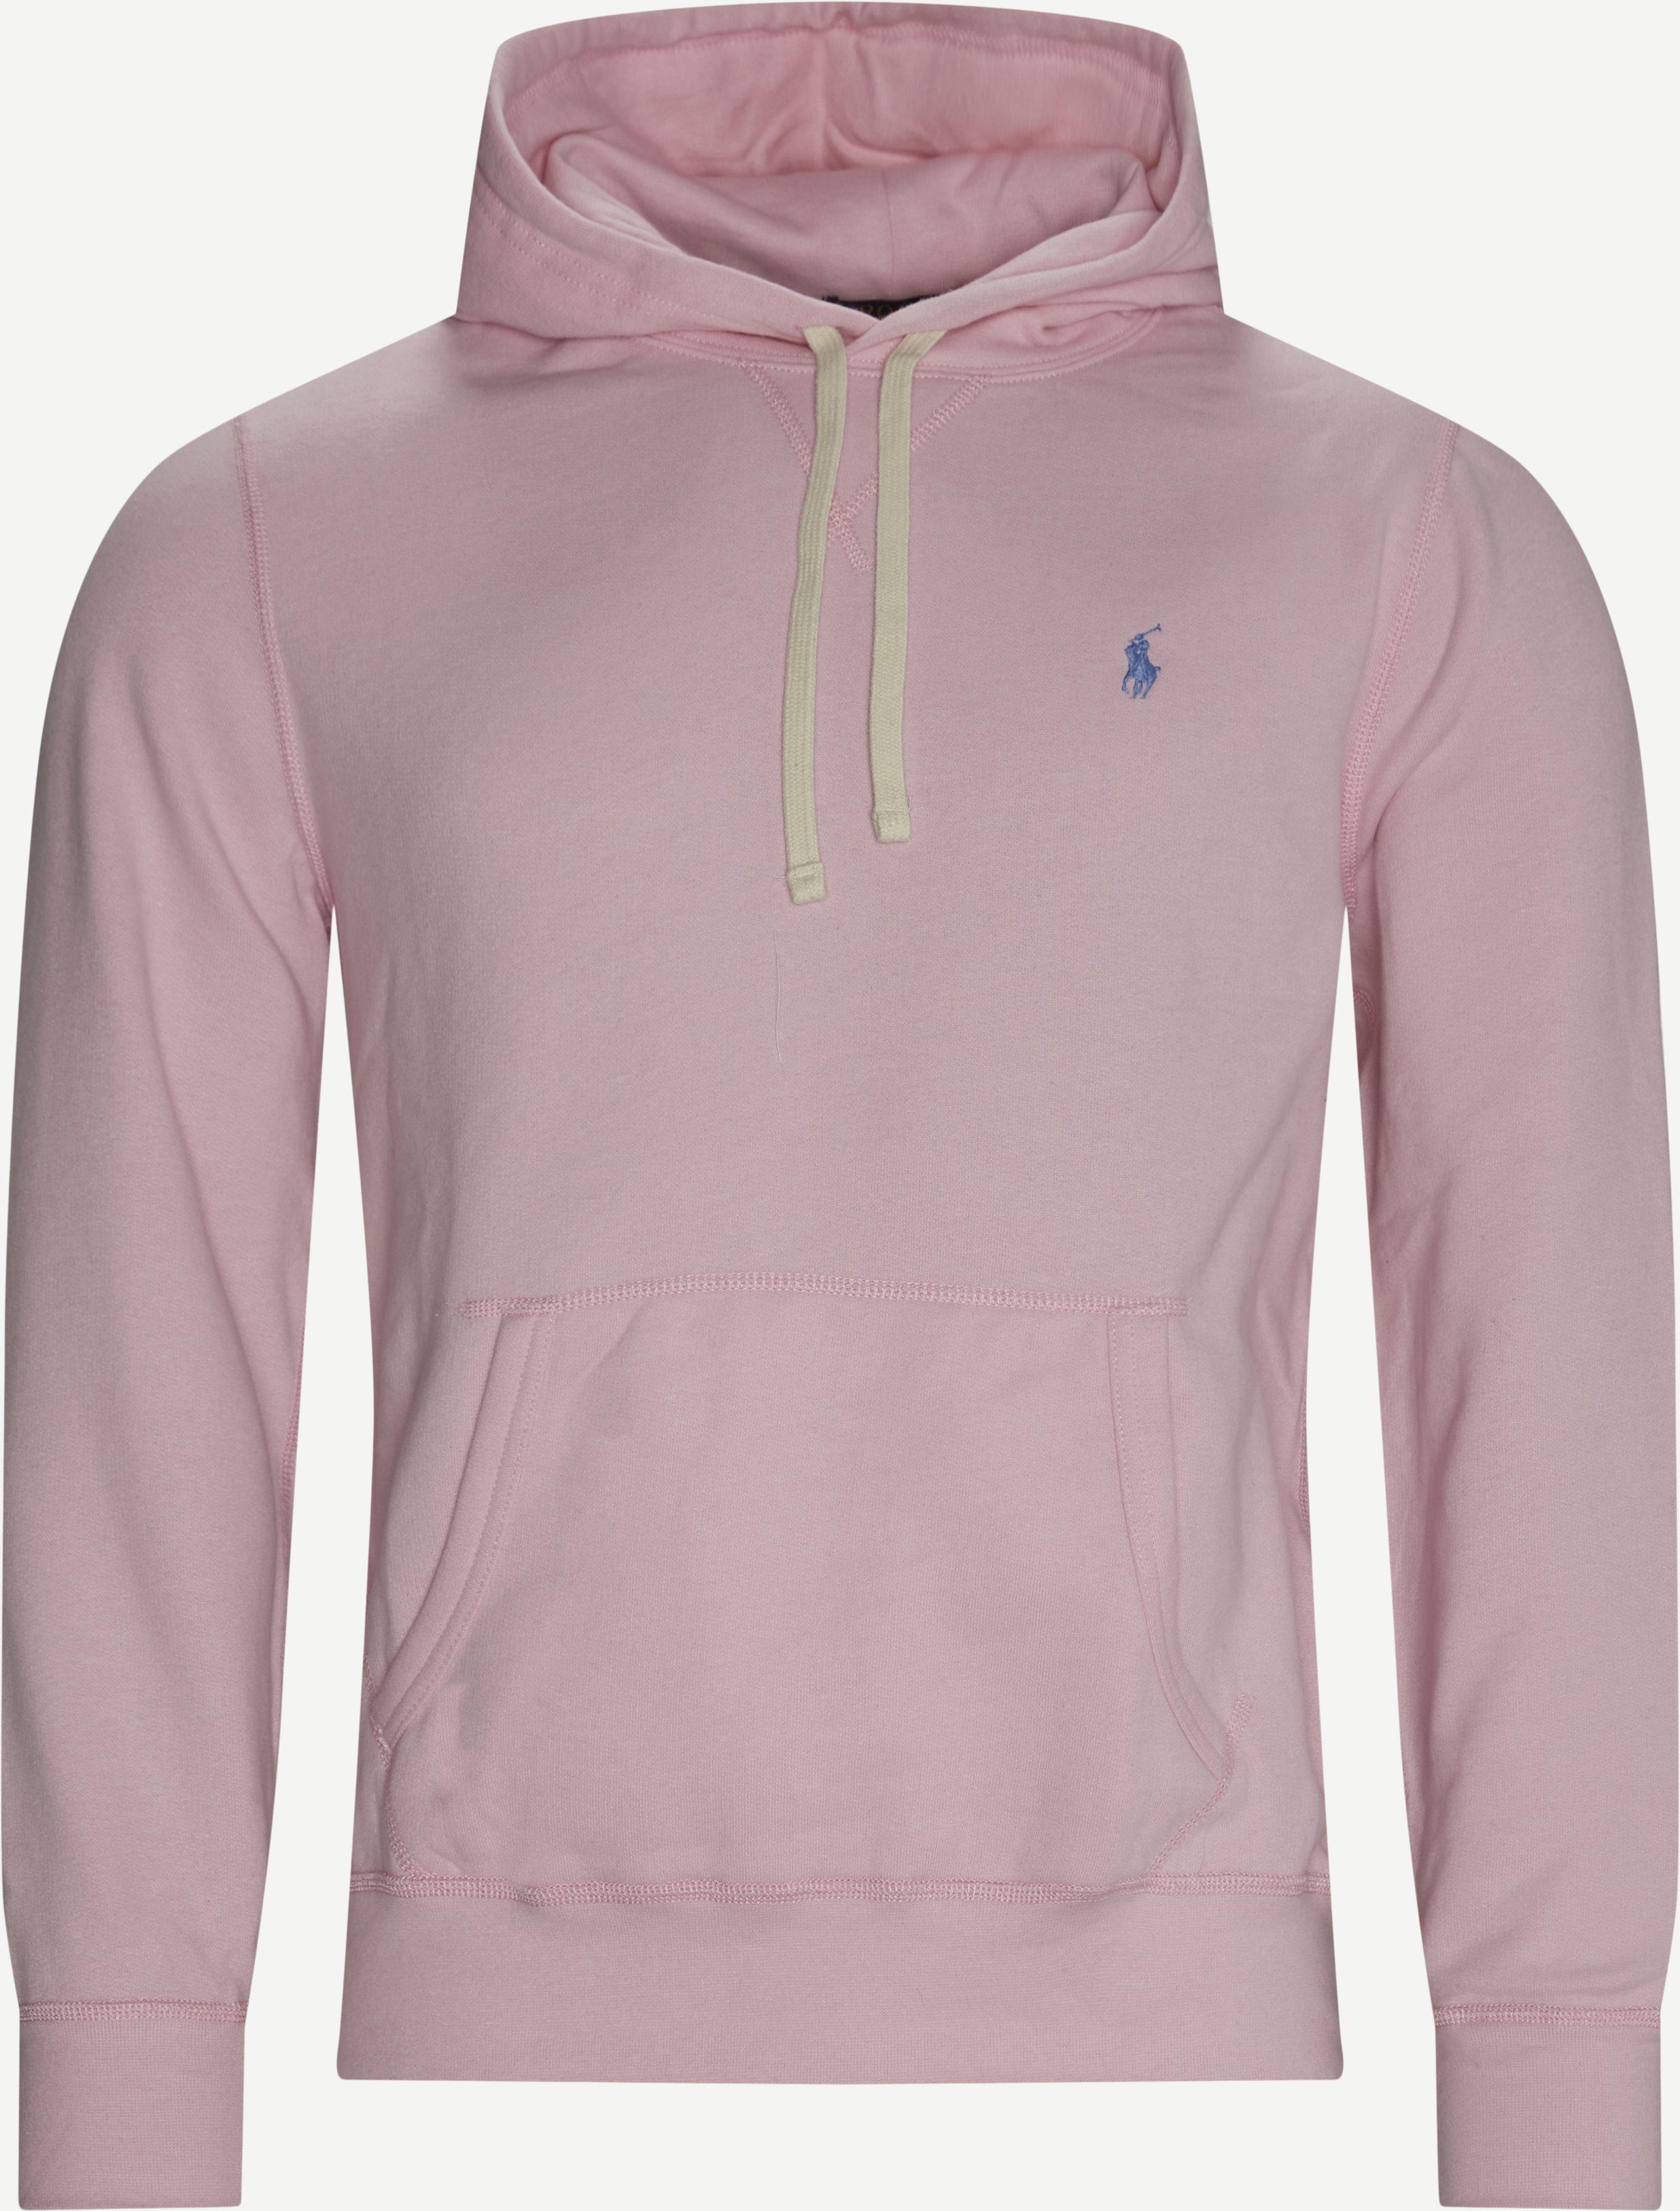 Hooded Sweatshirt - Sweatshirts - Regular fit - Pink